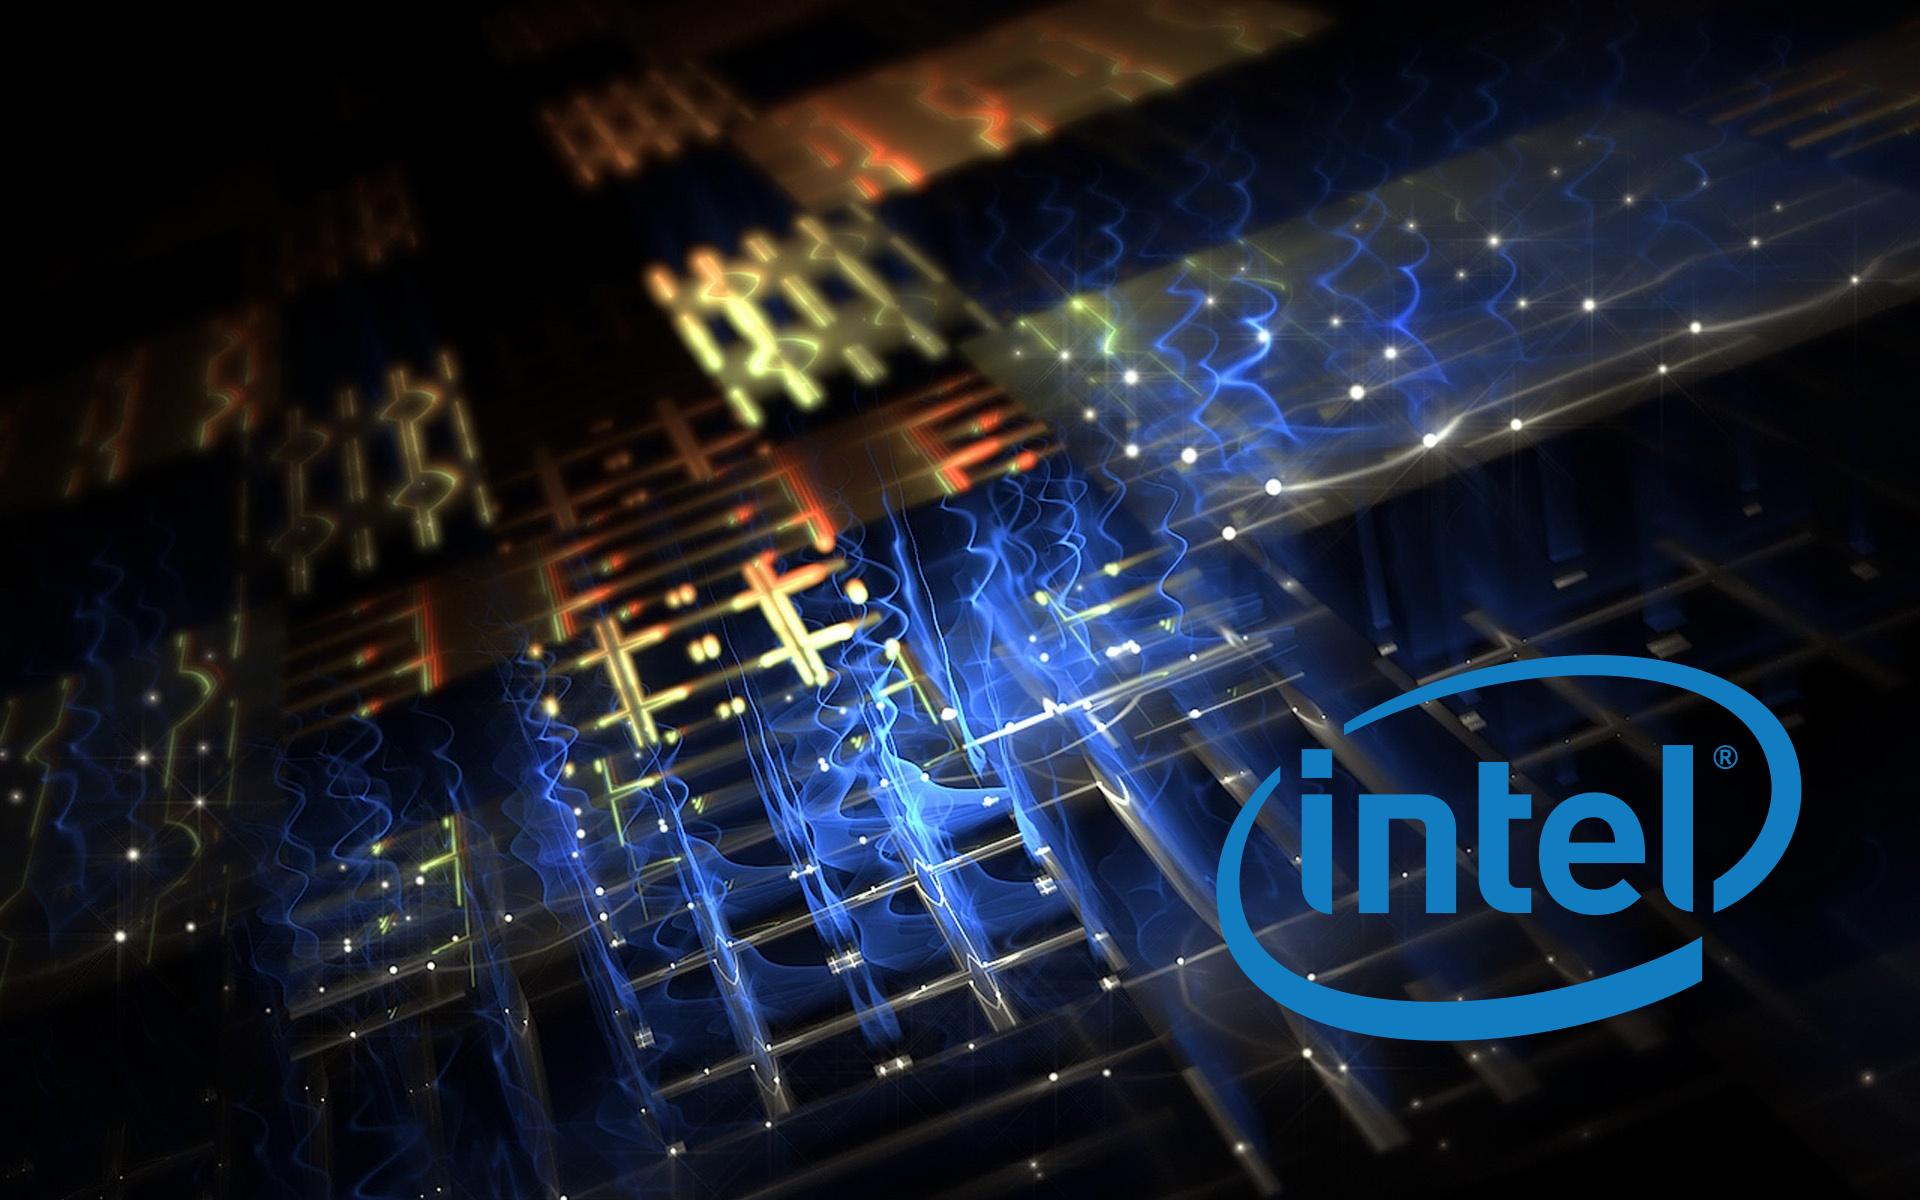 hi tech processor intel logo technology Electric lights 1920x1200